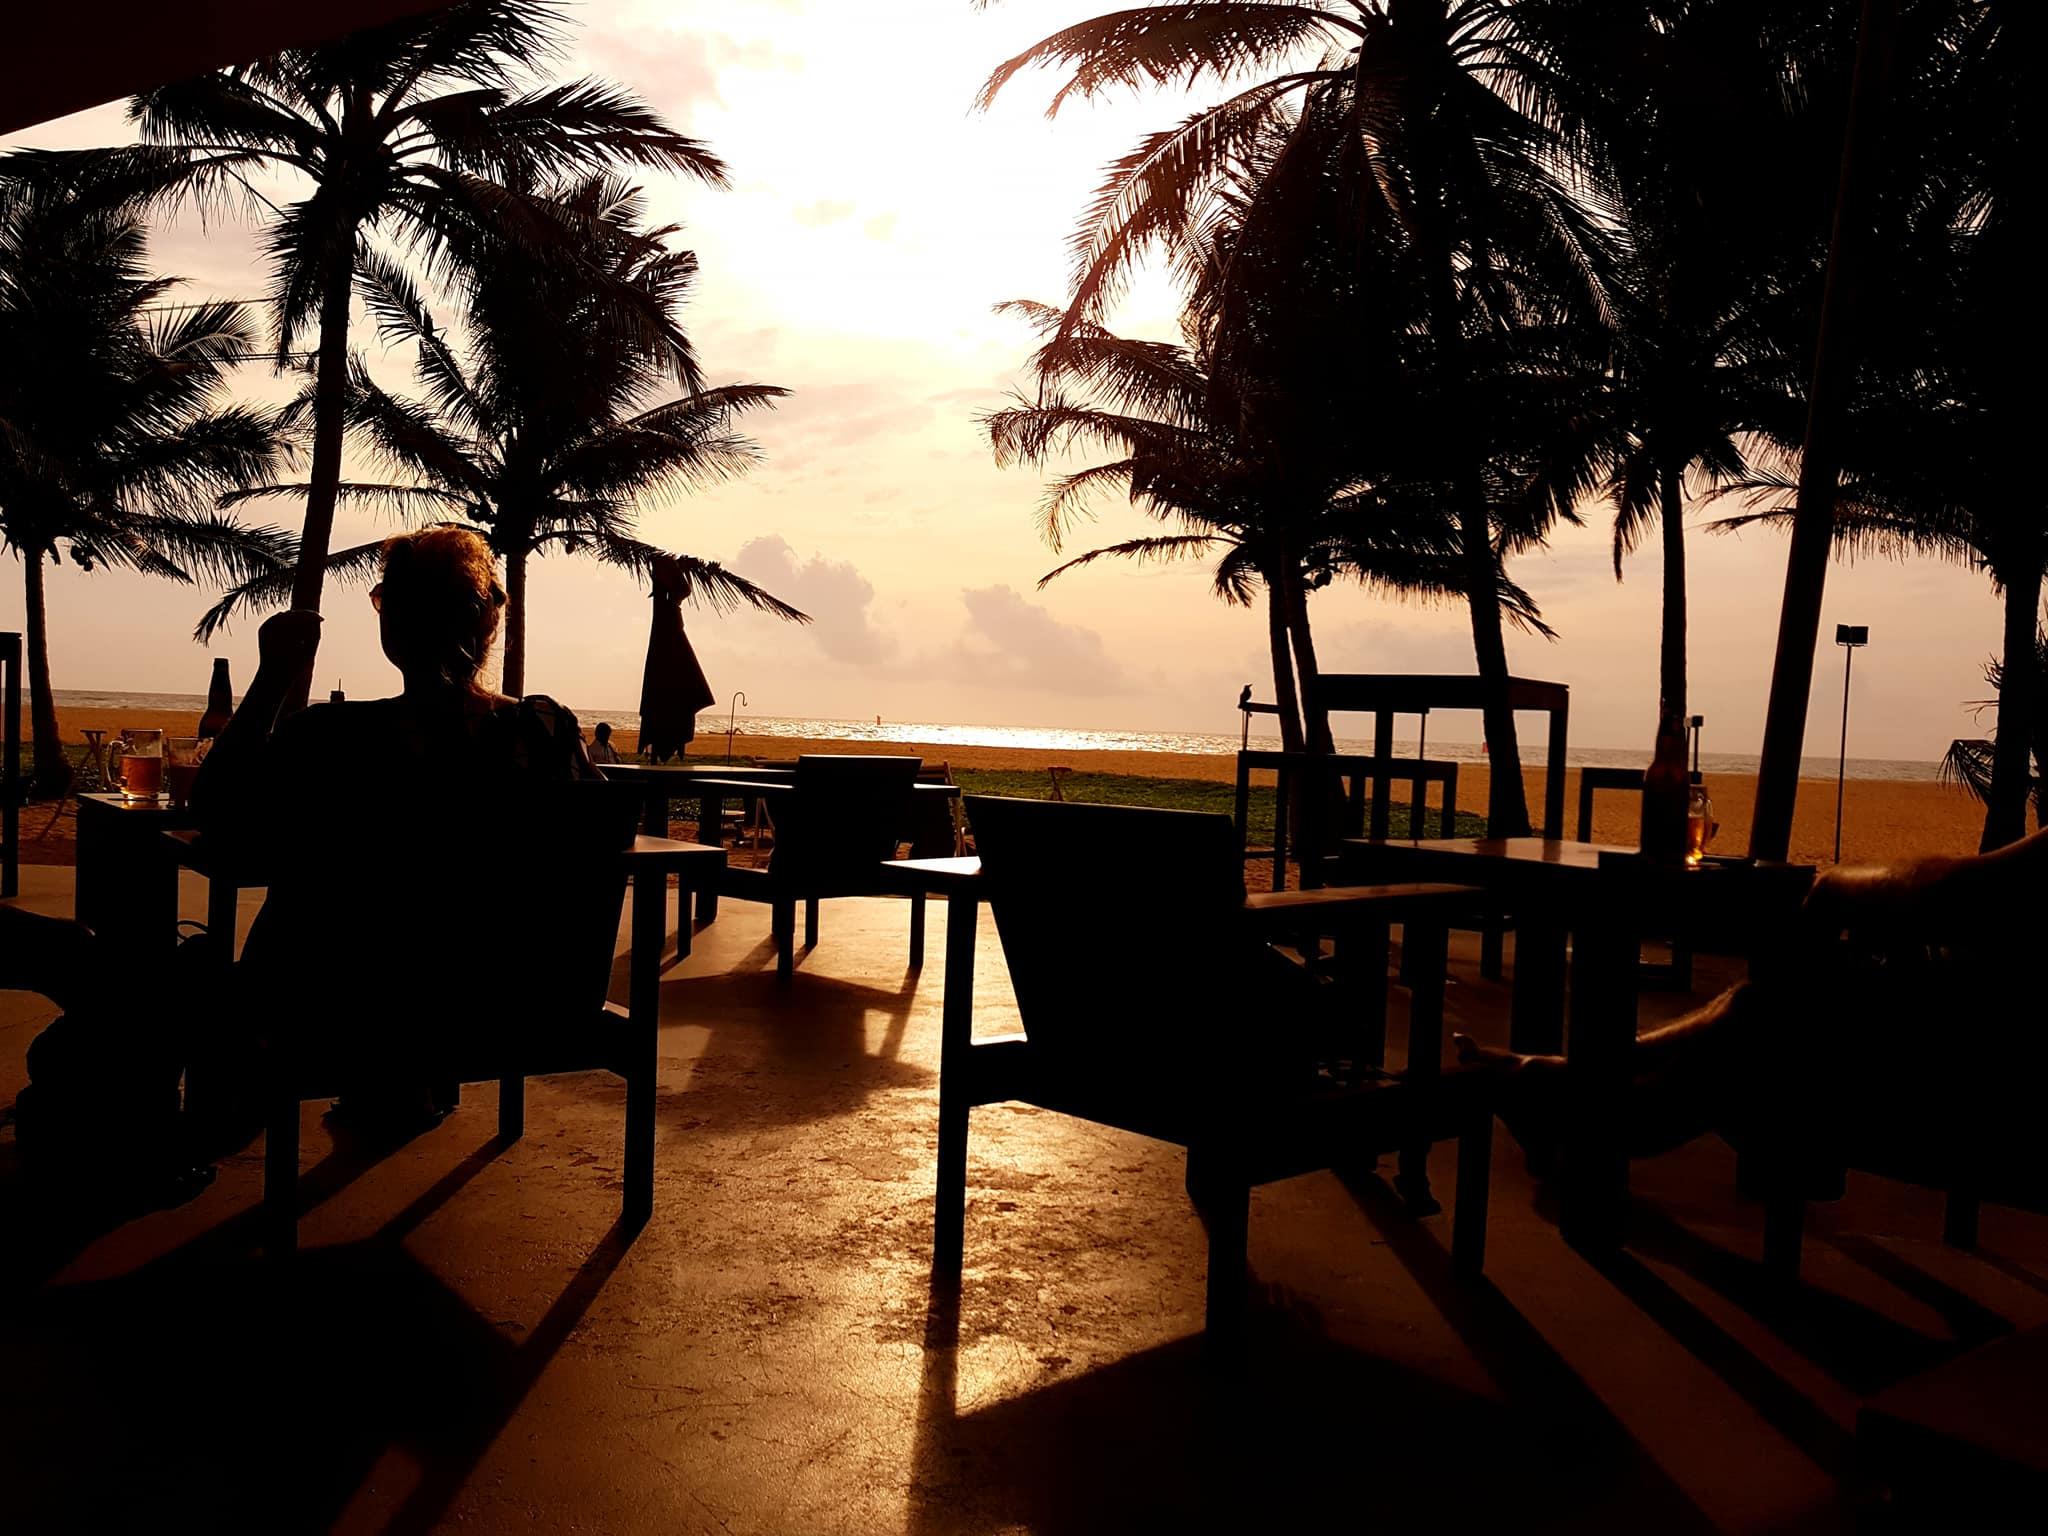 invite-to-paradise-sri-lanka-maldives-holiday-honeymoon-specialists-customer-guest-feedback-zane-lisa-butcher-hotel-jetwing-beach-sunset.jpg